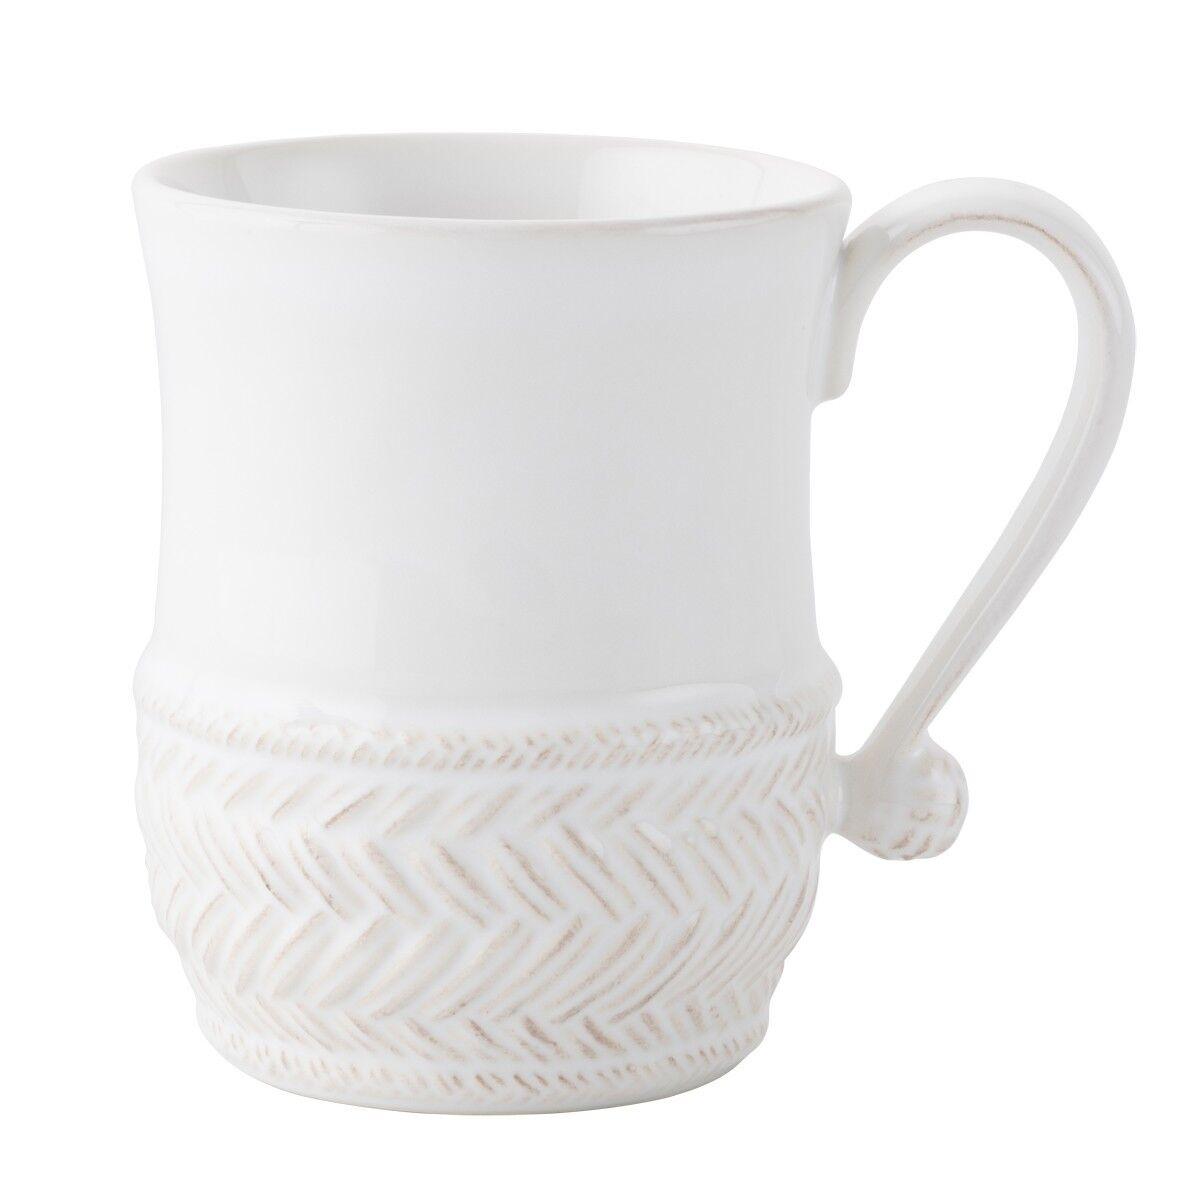 Juliska Le Panier blancwash Mug - Set of 4